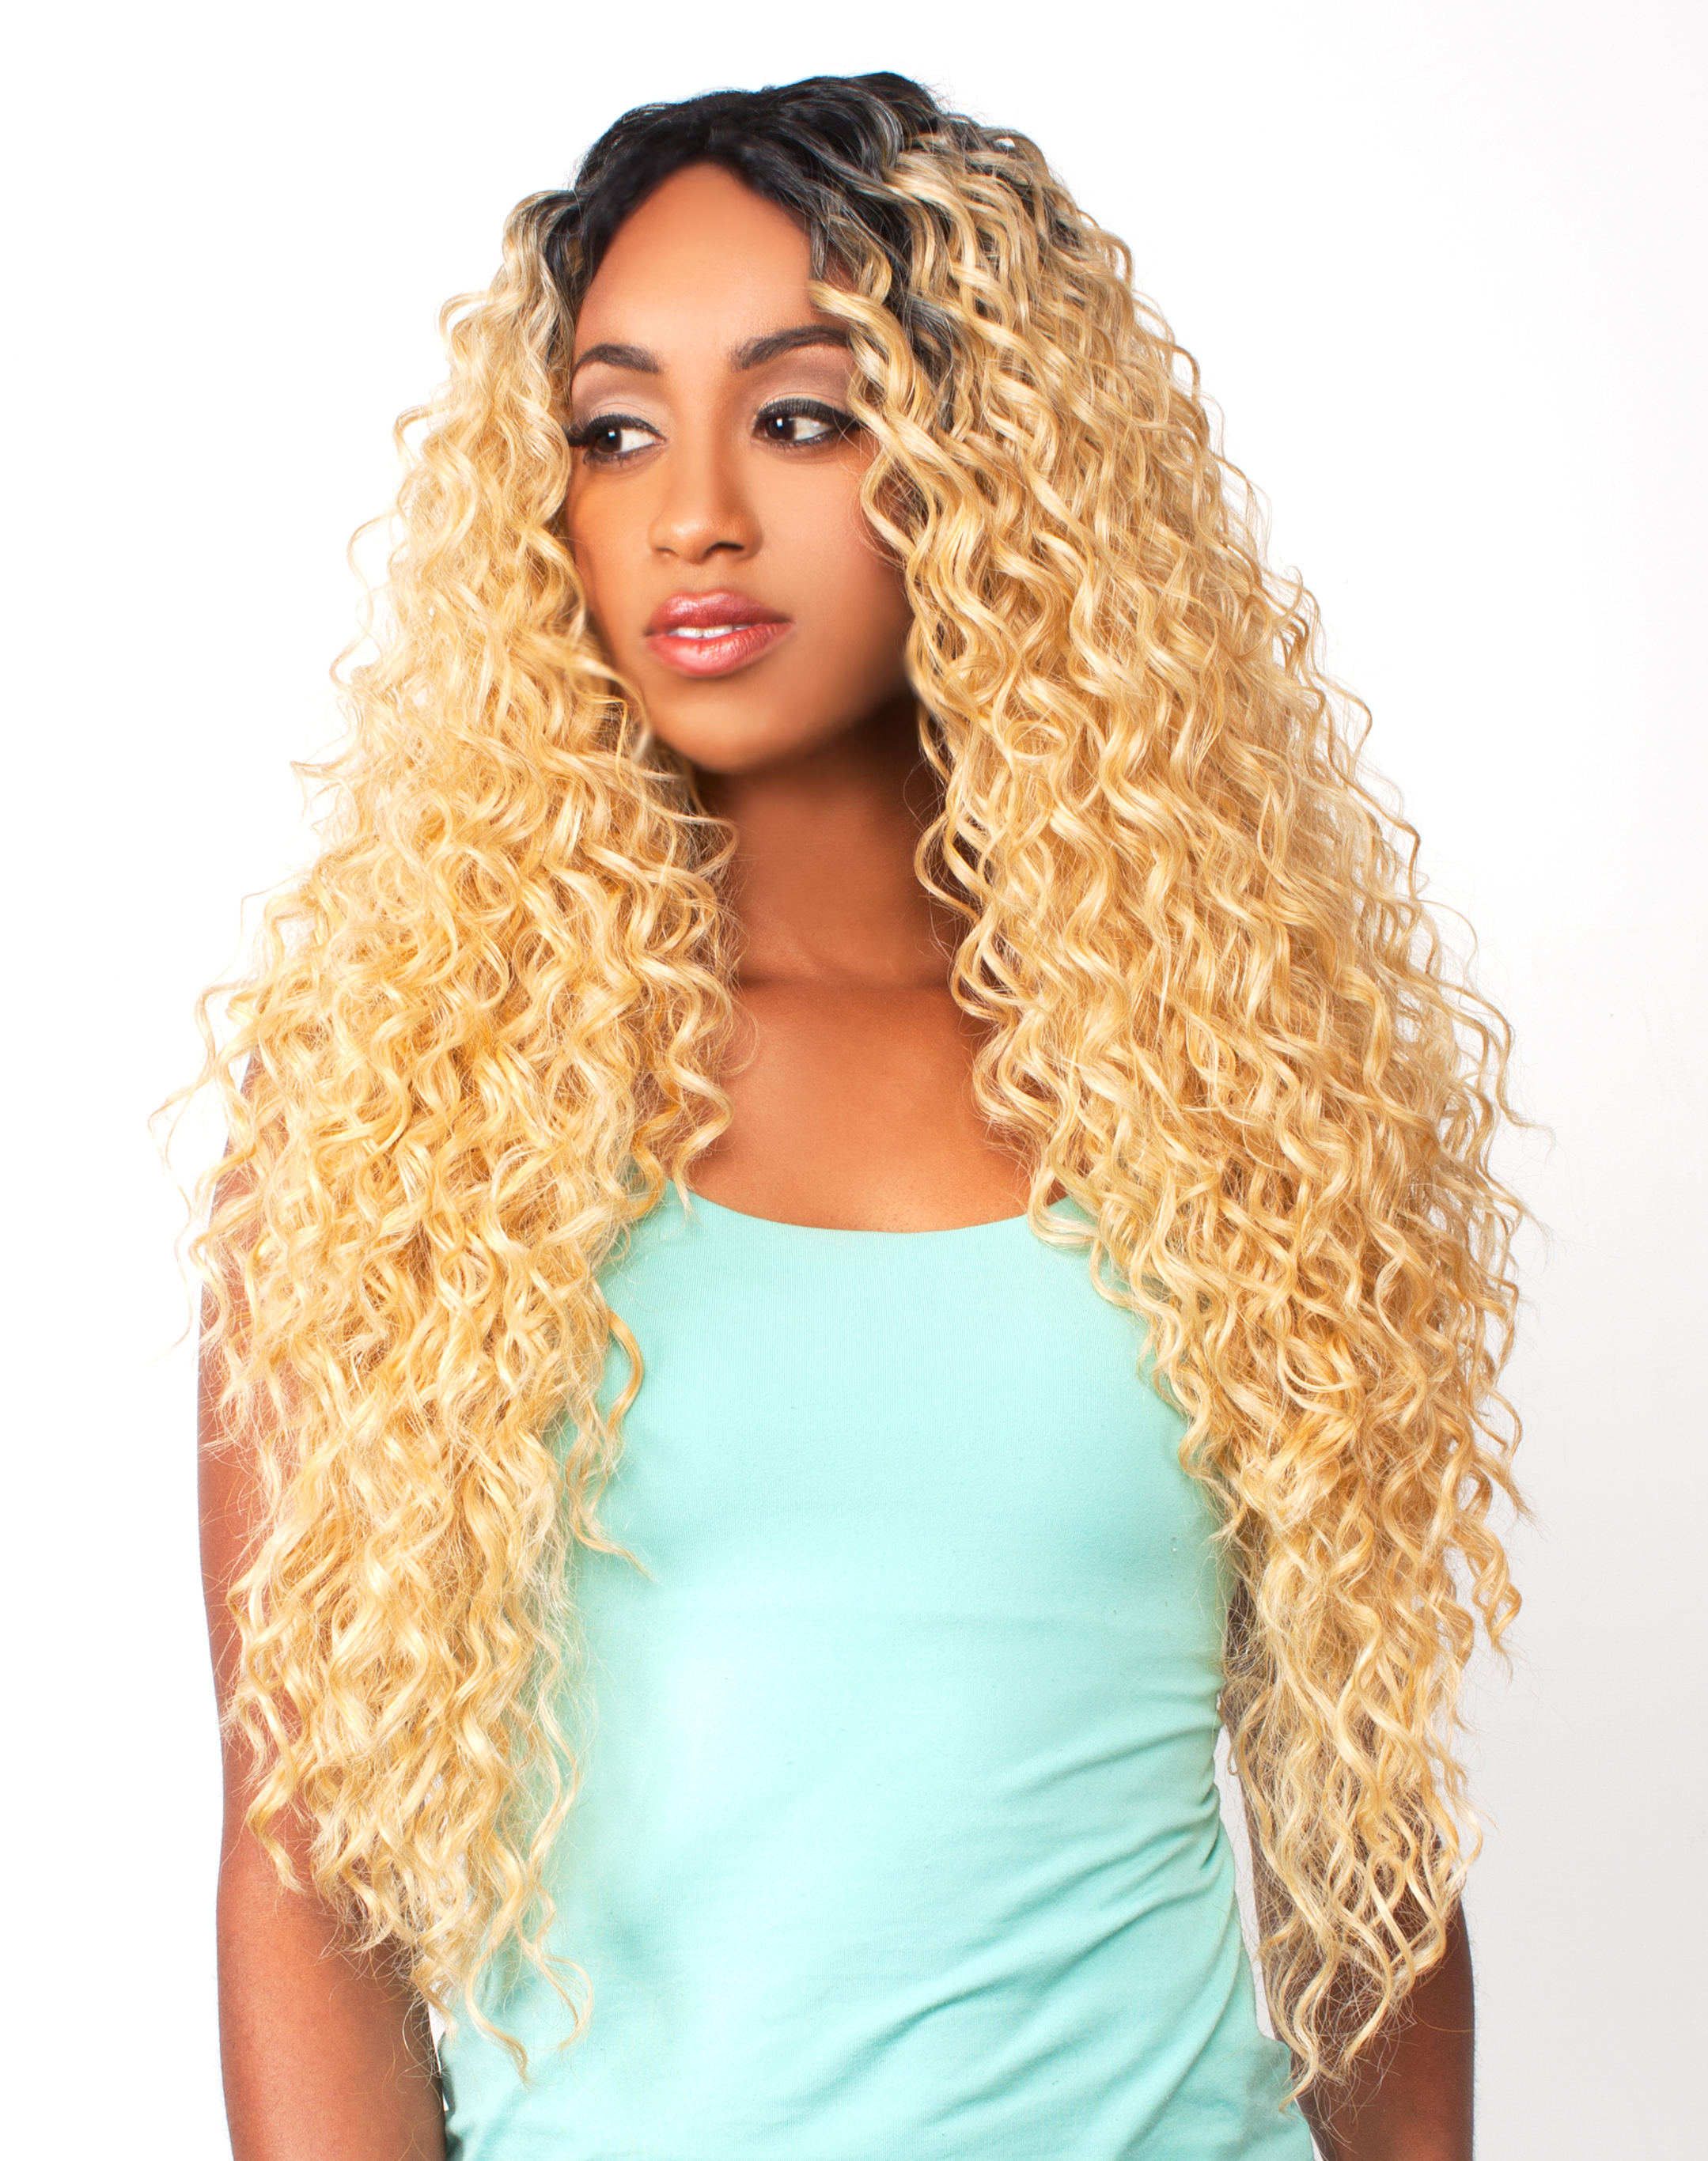 LH PERUVIAN - THE WIG BRAZILIAN HUMAN HAIR BLEND INVISIBLE